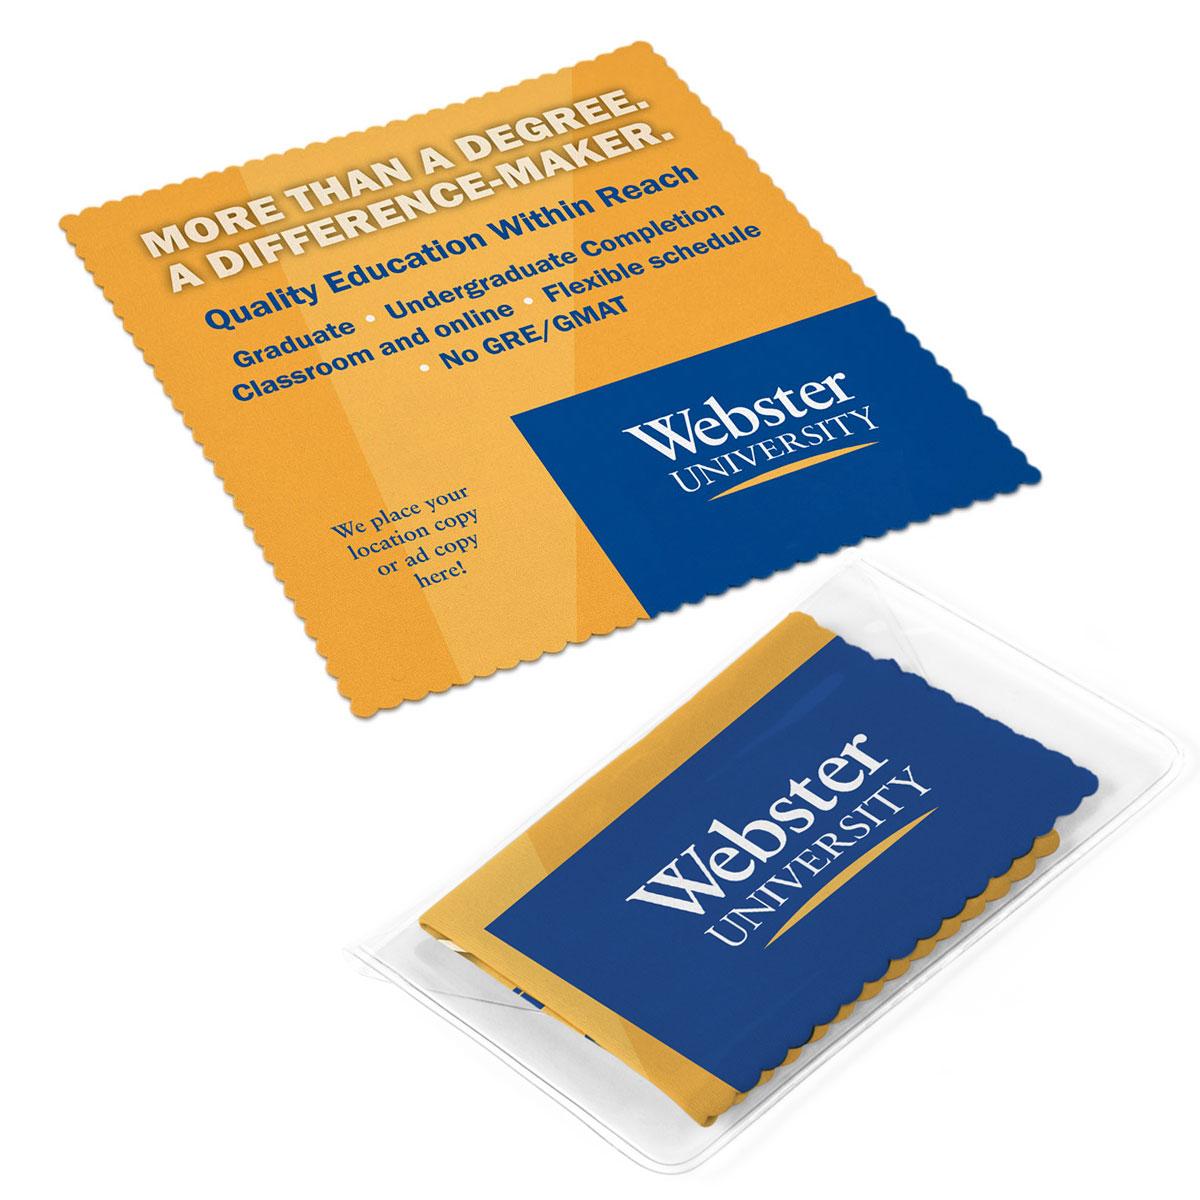 Opper Fiber Ultra Microfiber Cleaning Cloth 207 01